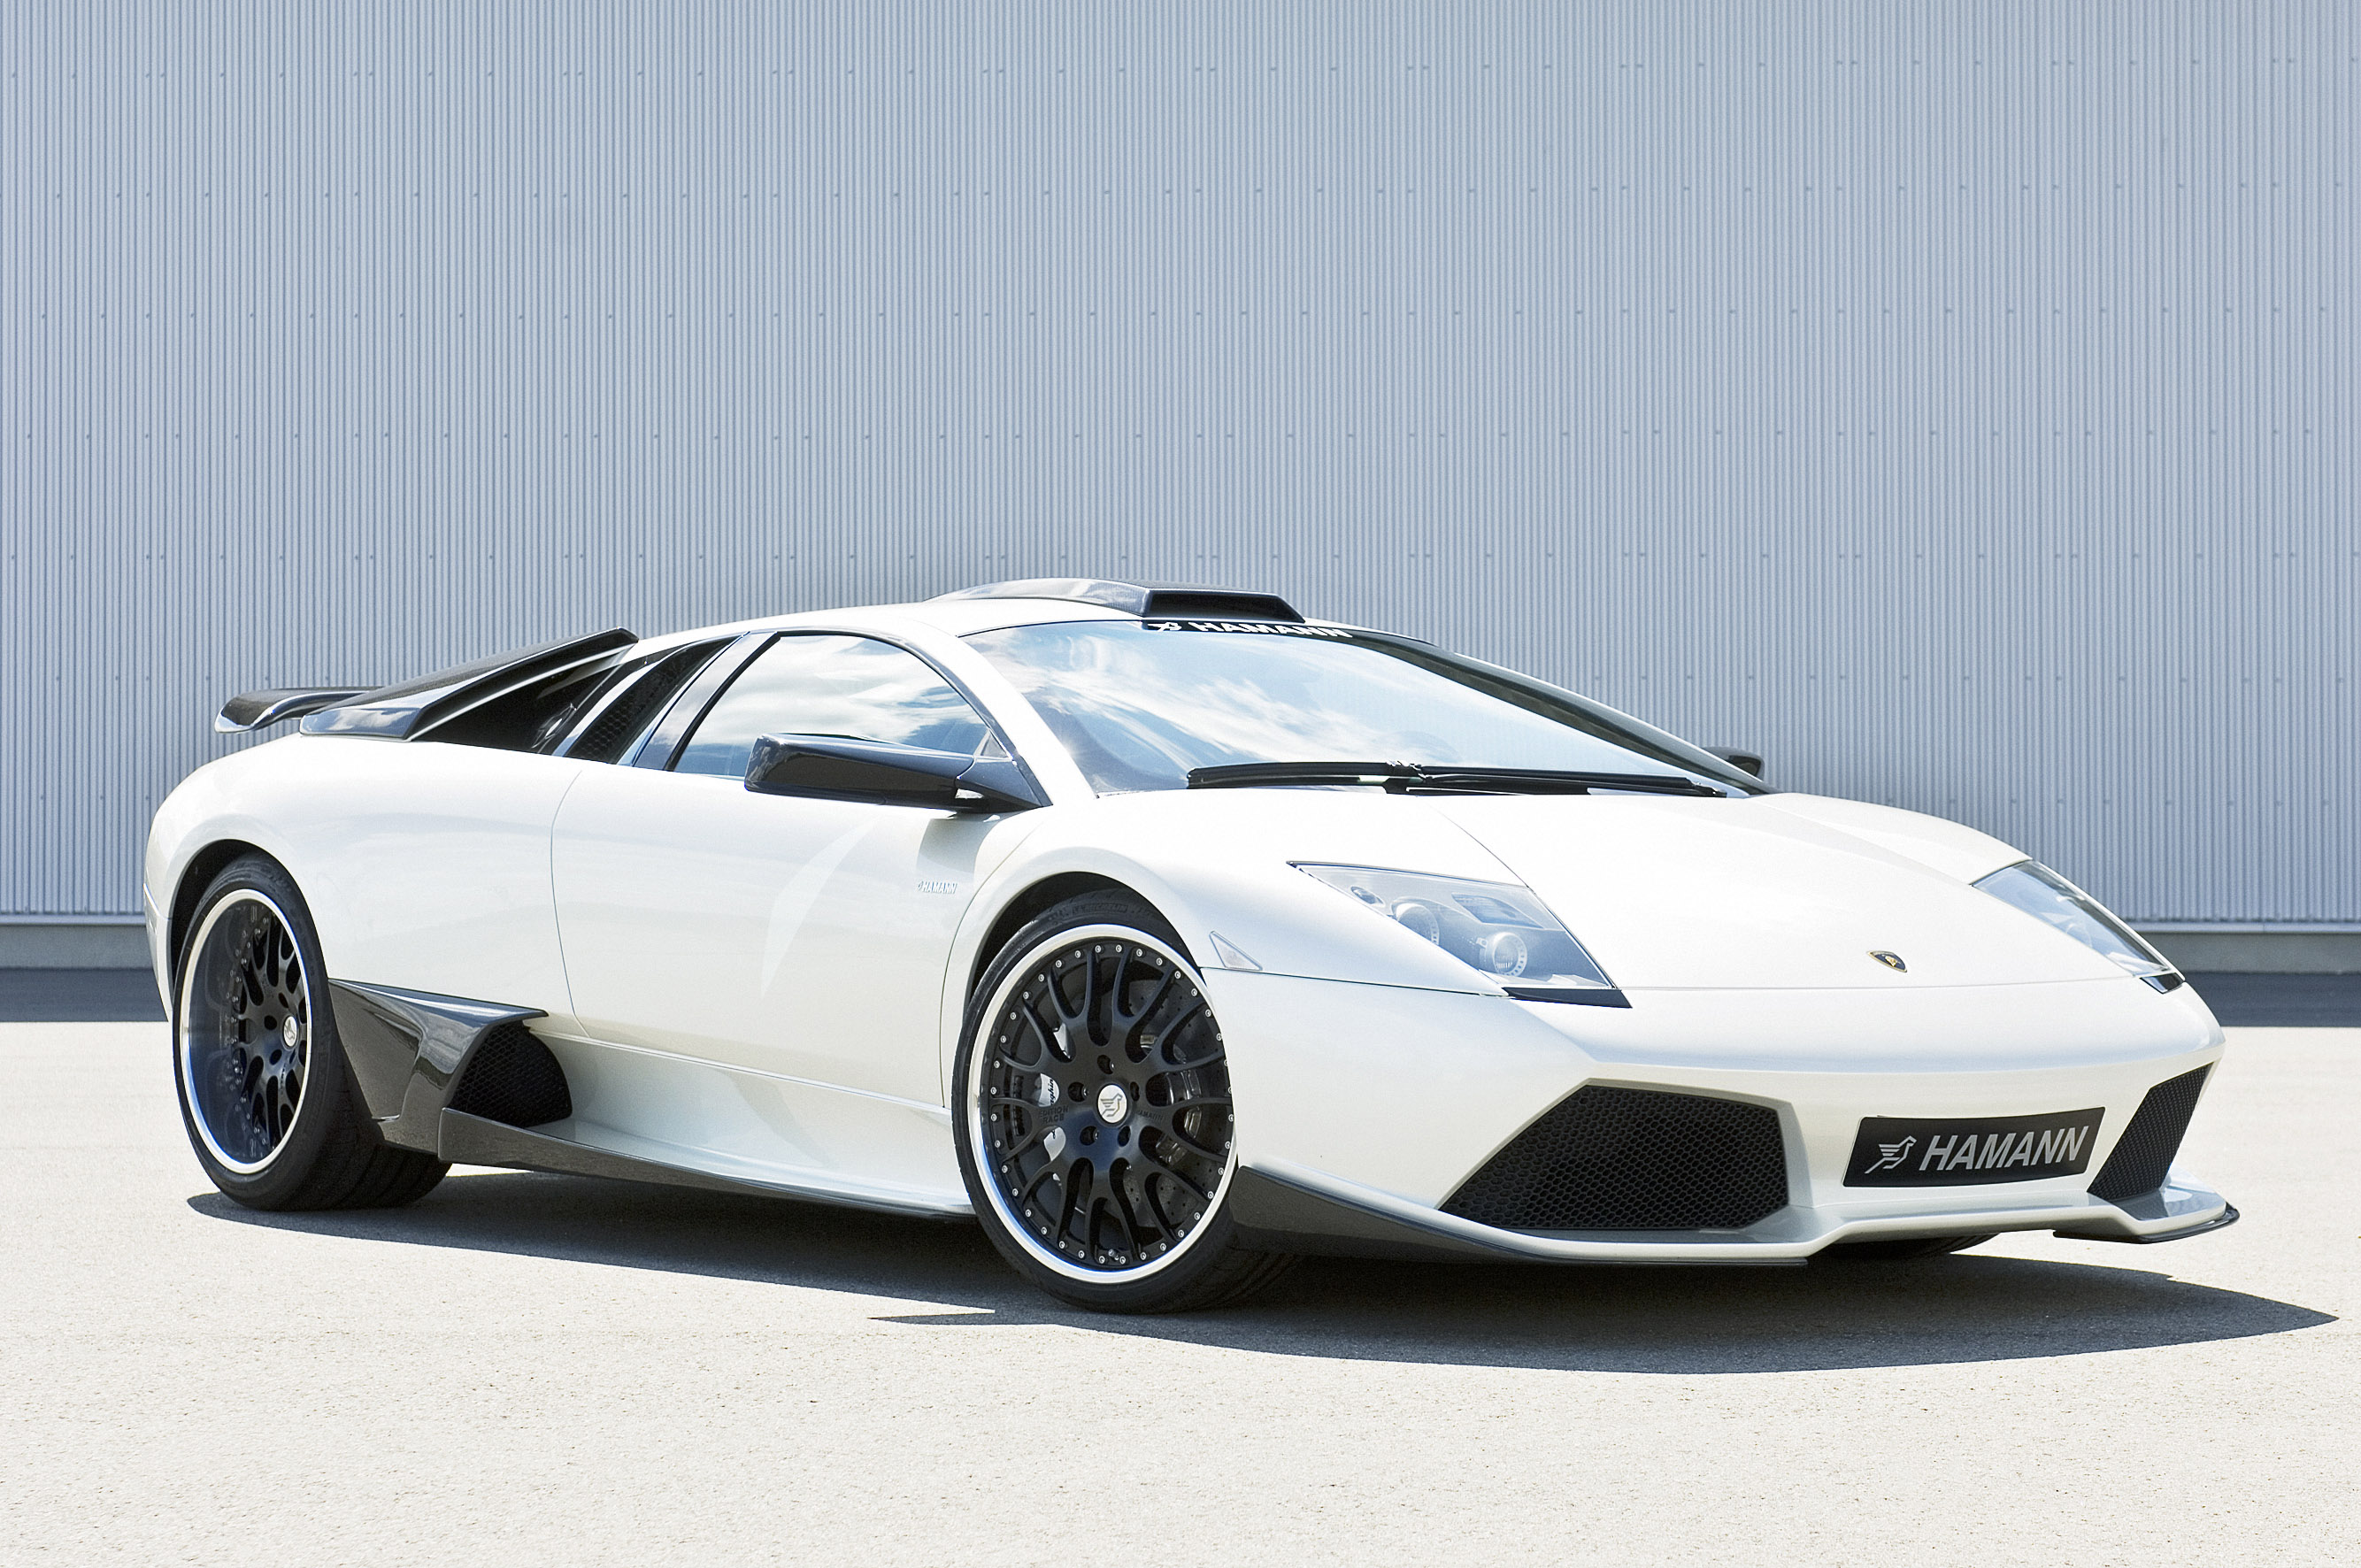 Lamborghini Murcielago LP640 Hamann | Better On Black Italia? | Flickr